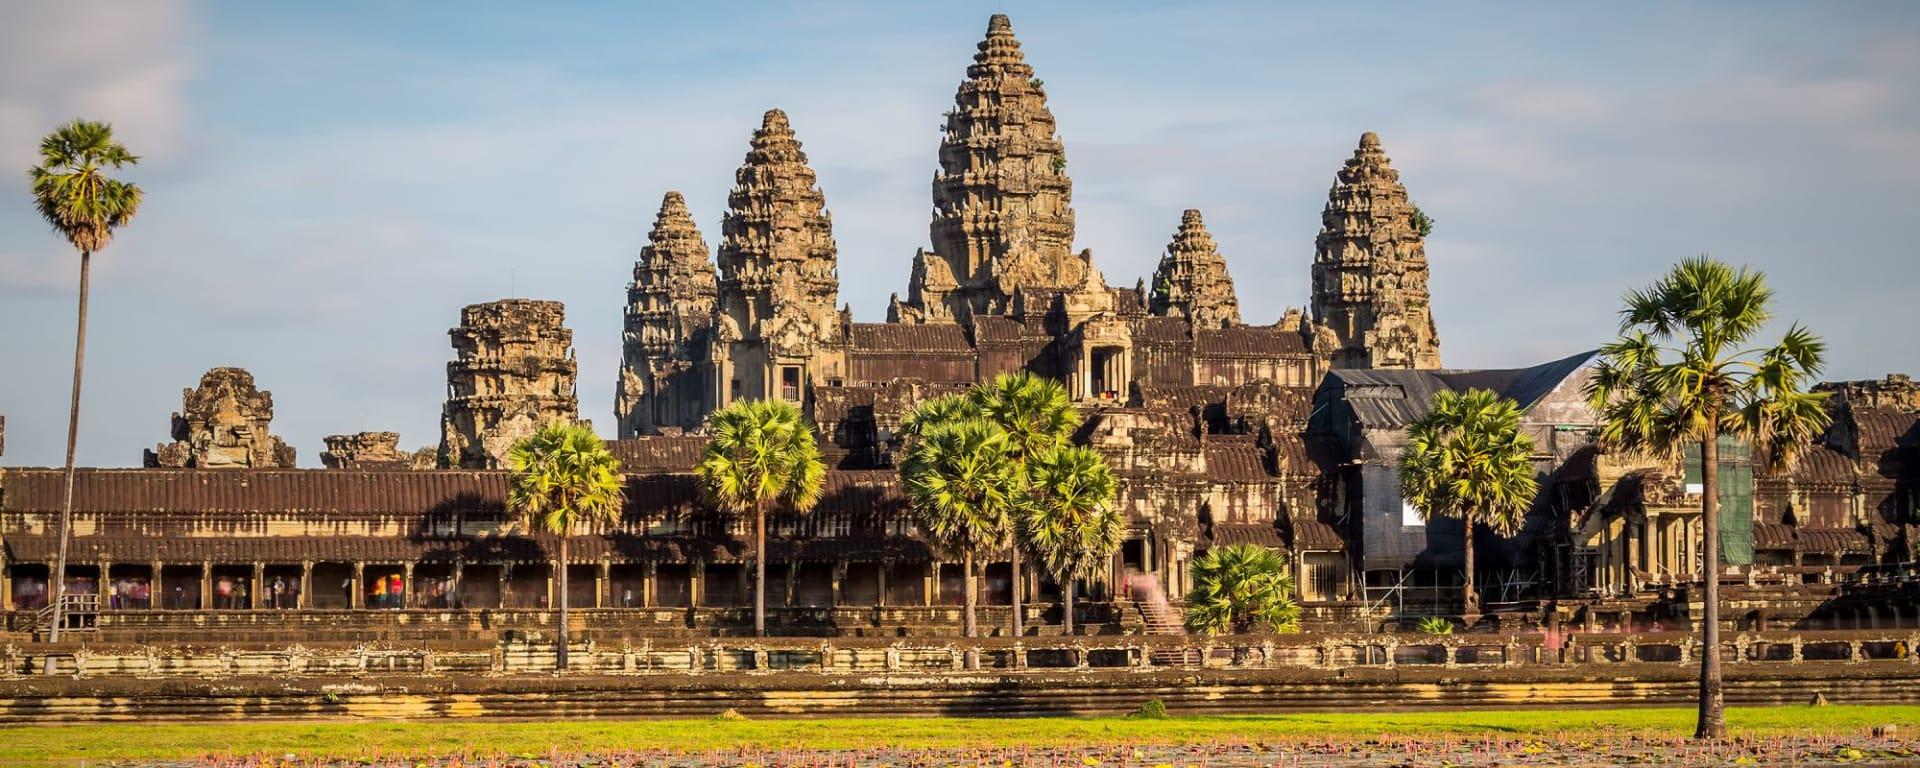 Grand voyage en Indochine de Hanoi: Siem Reap Angkor Wat